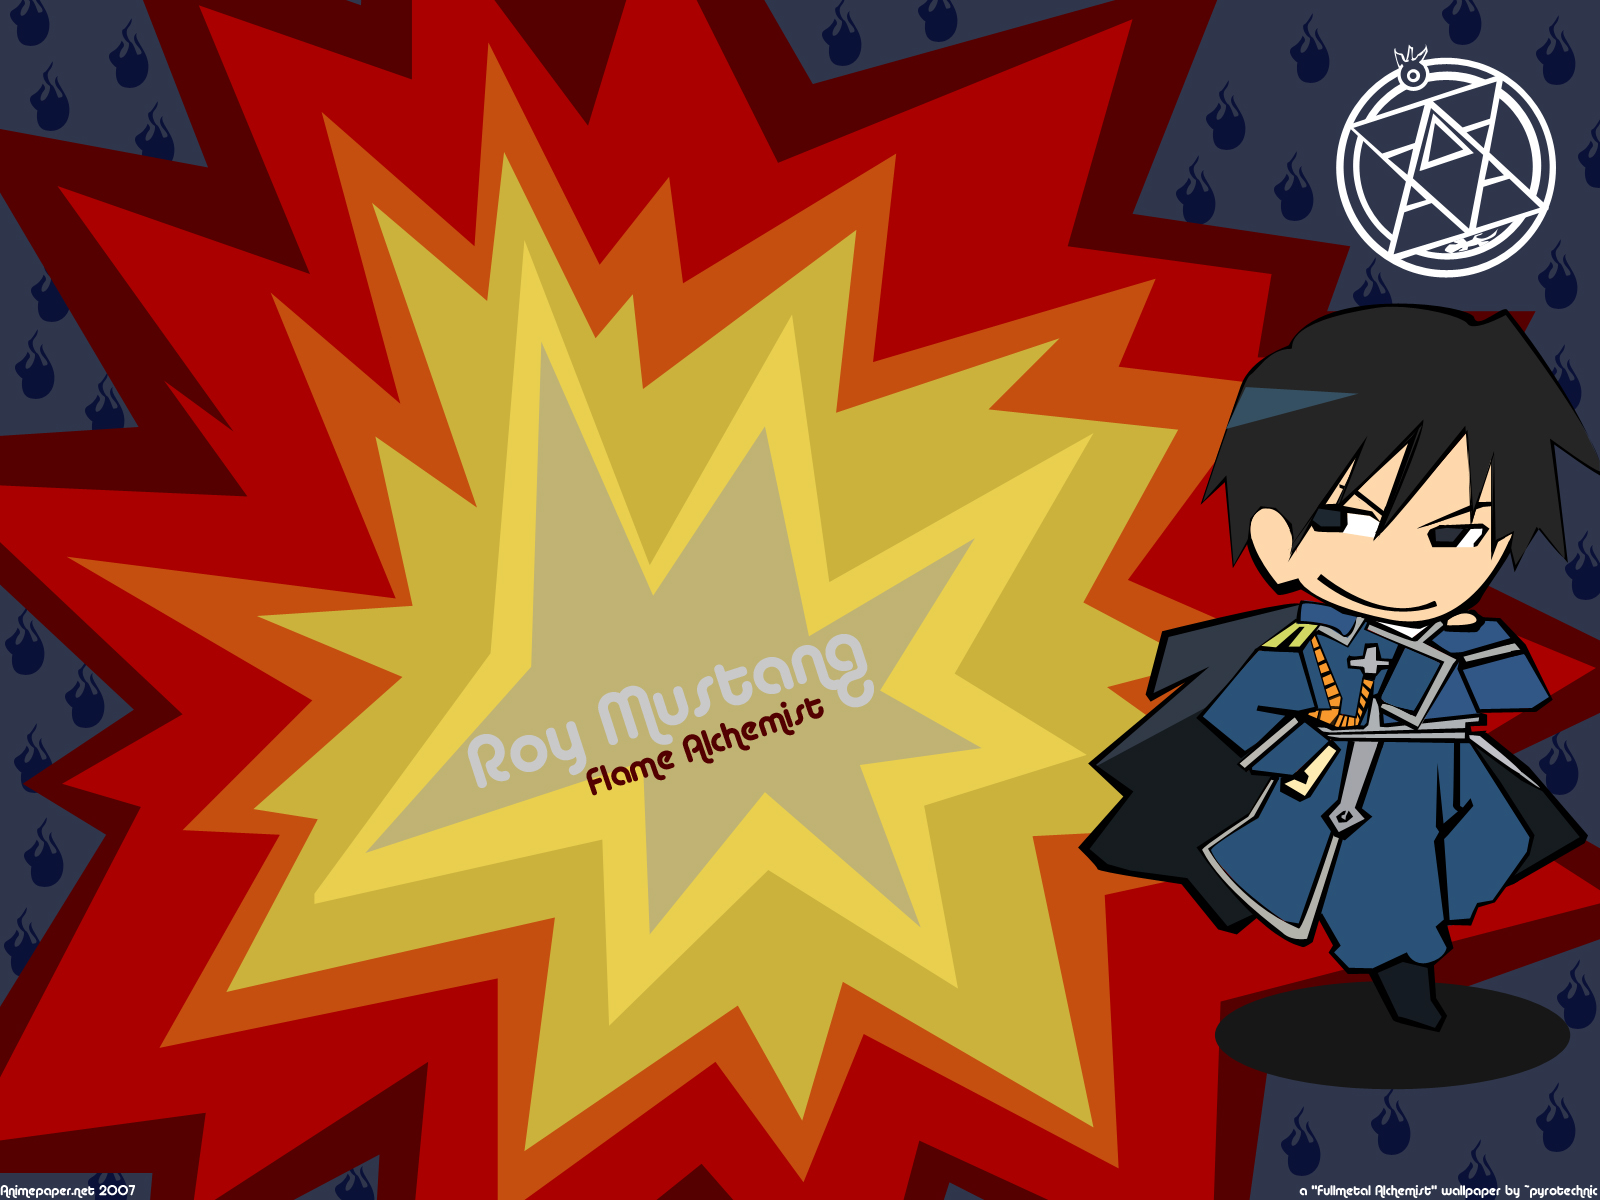 fullmetal_alchemist roy_mustang uniform